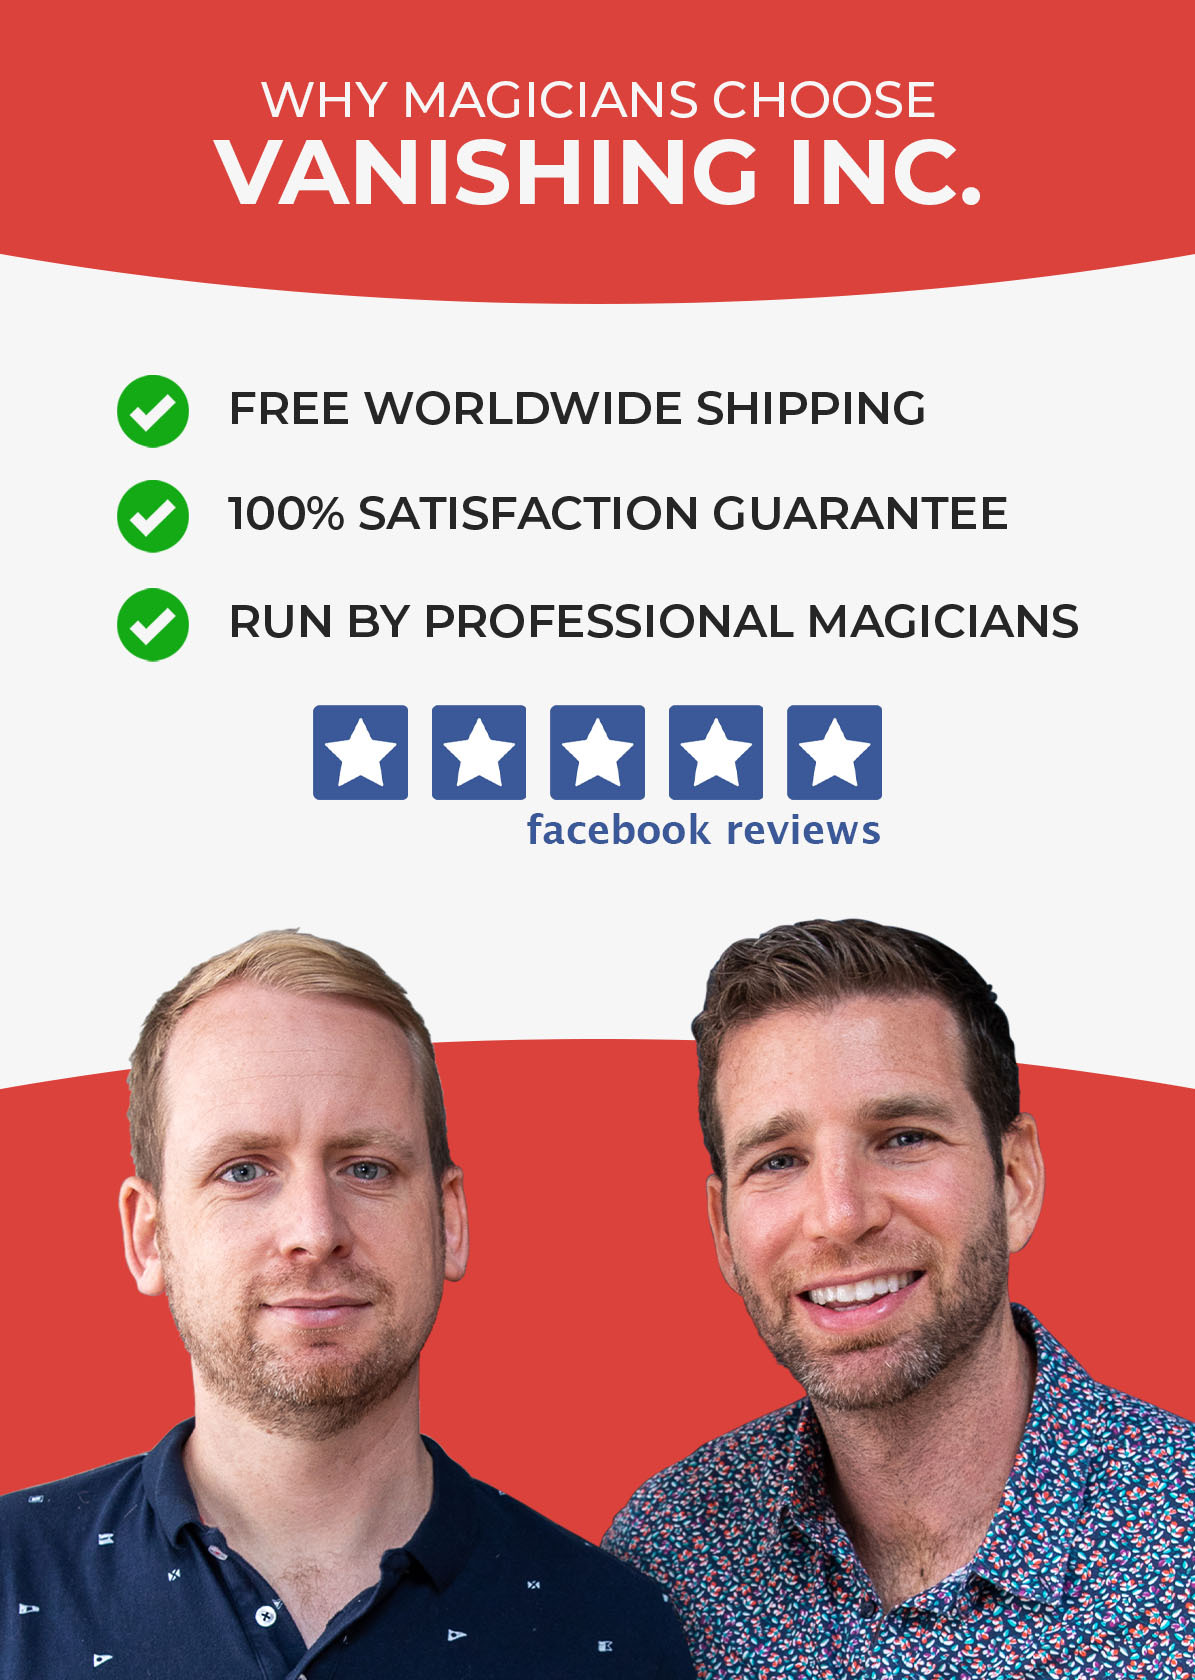 Why magicians choose Vanishing Inc. magic shop